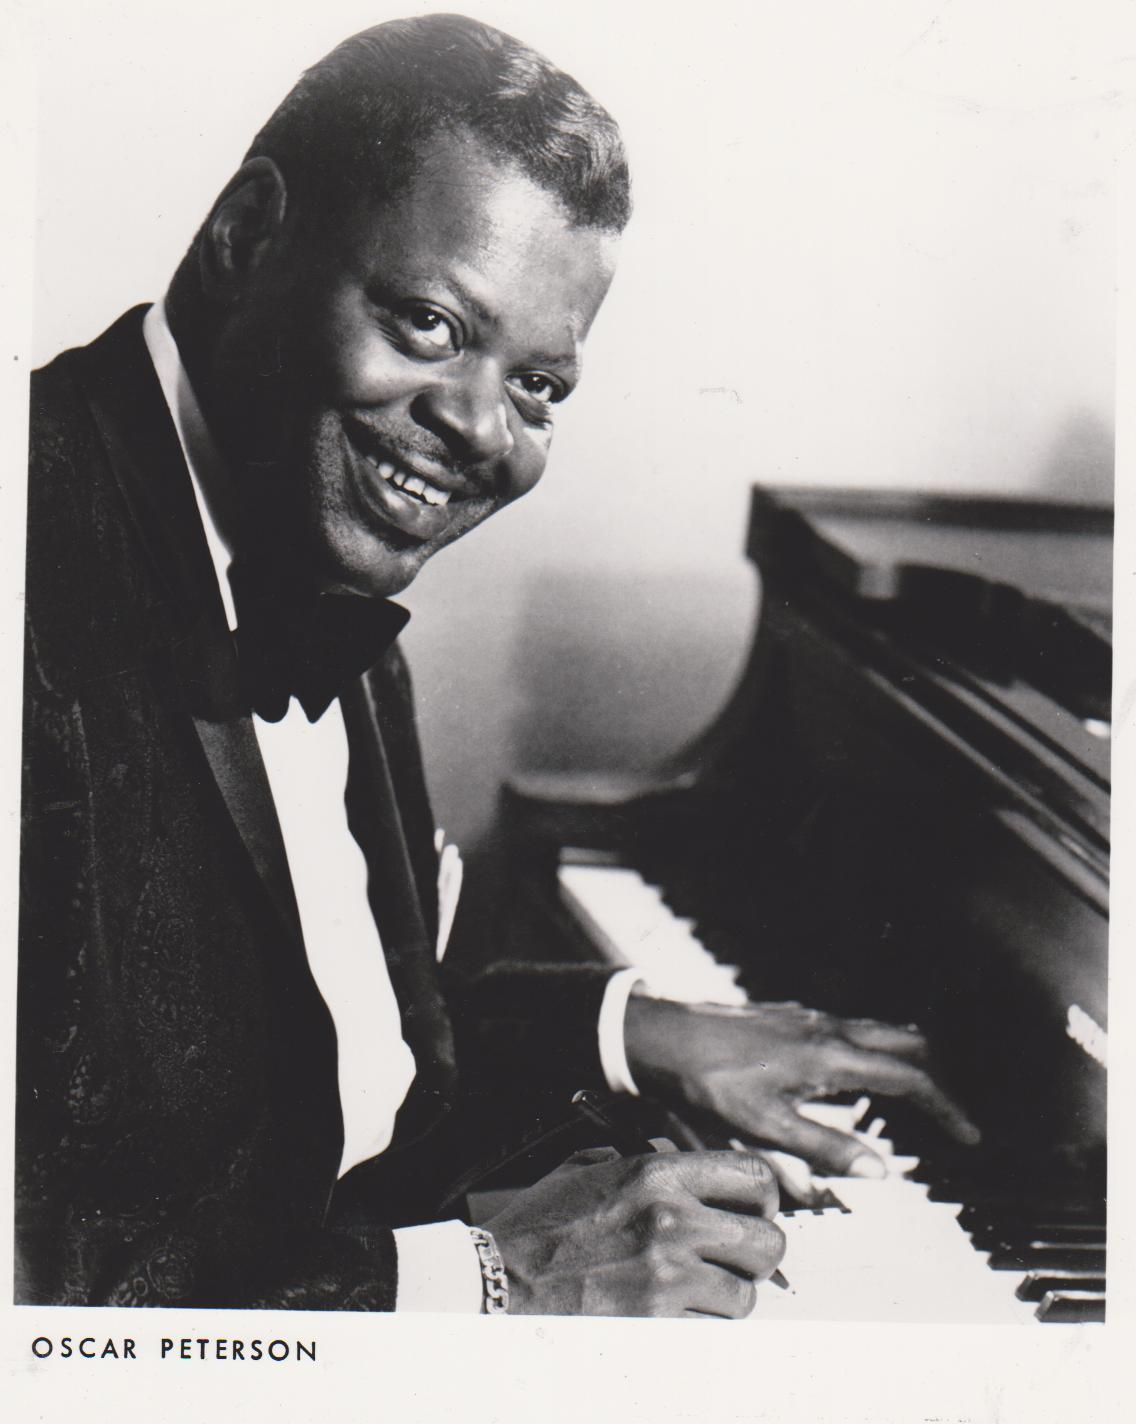 Oscar Peterson Vintage 8X10 BW Jazz Music Memorabilia Photo - $6.99